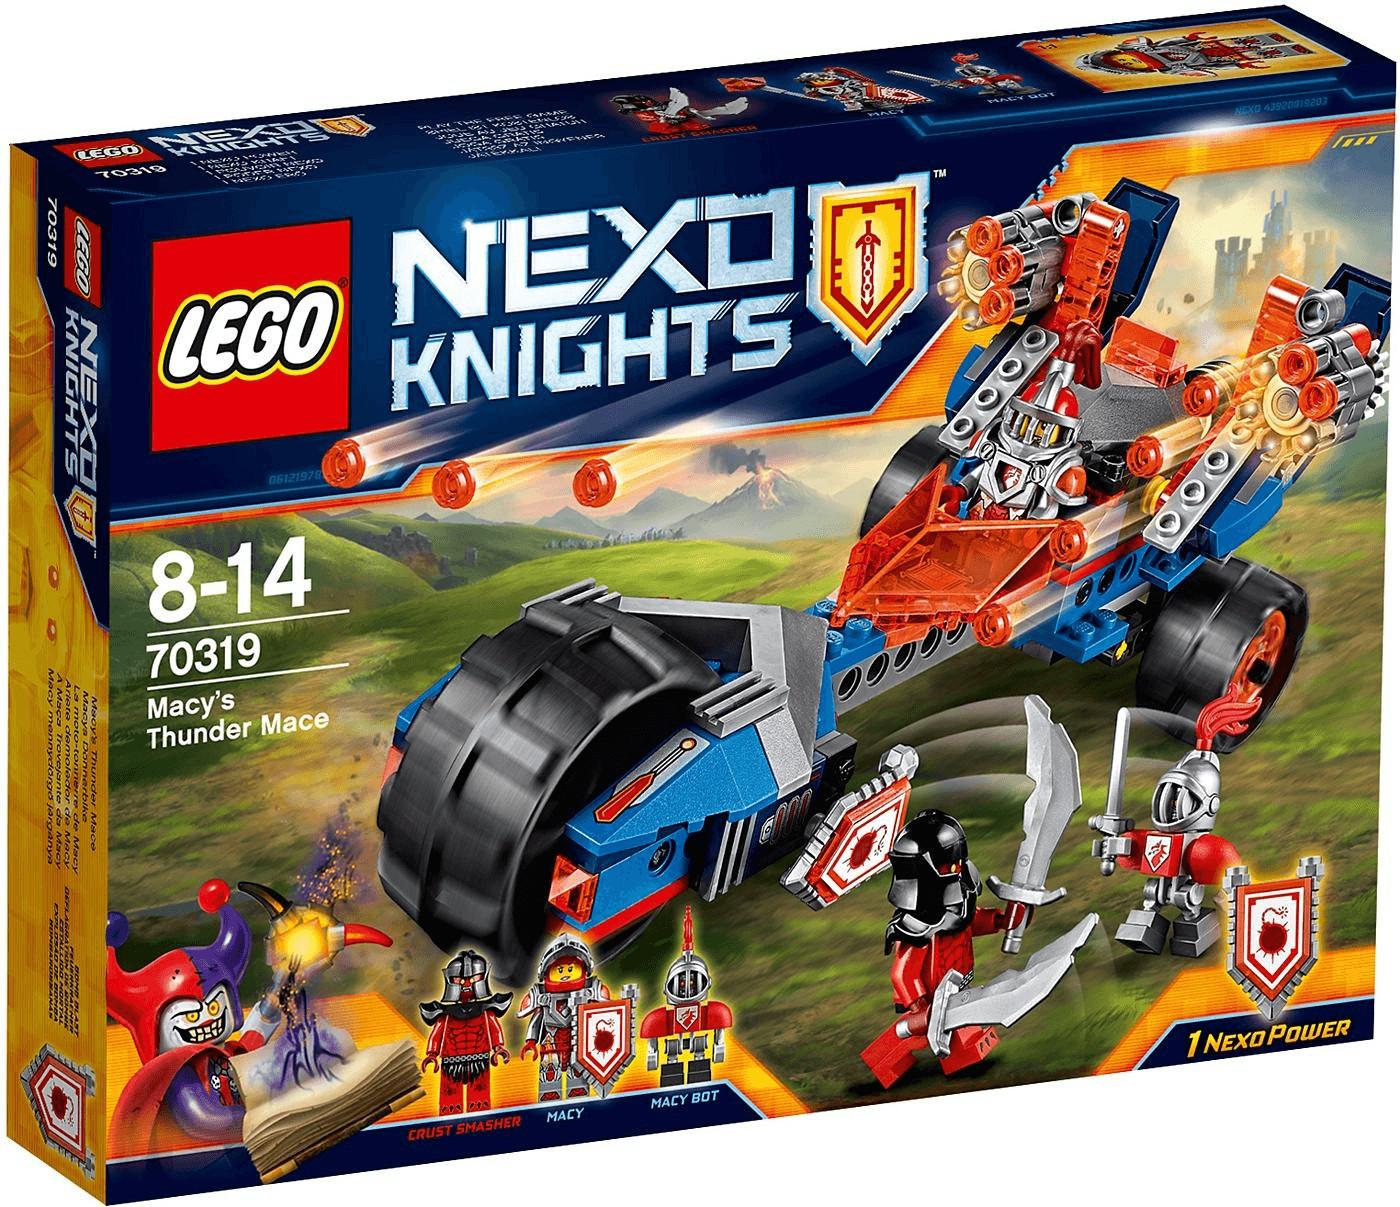 LEGO Nexo Knight - Macys Donnerbike (70319)